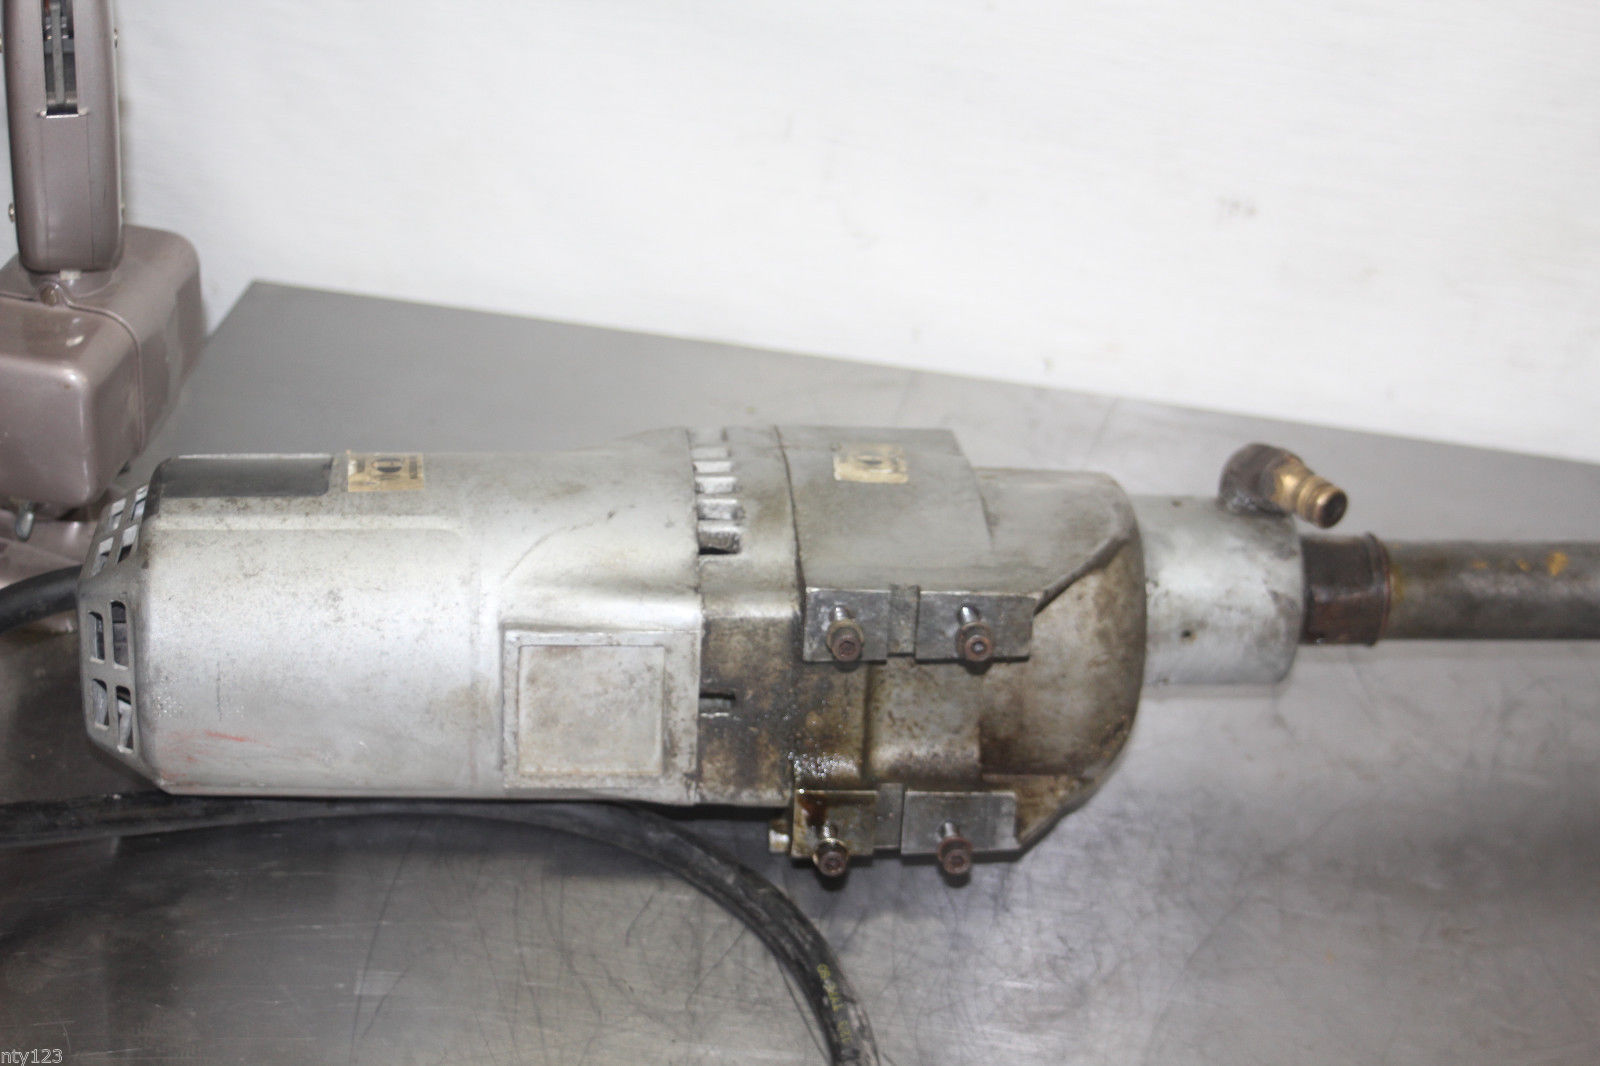 Milwaukee core drill motor 4079 with diamond bit core for Milwaukee core drill motor